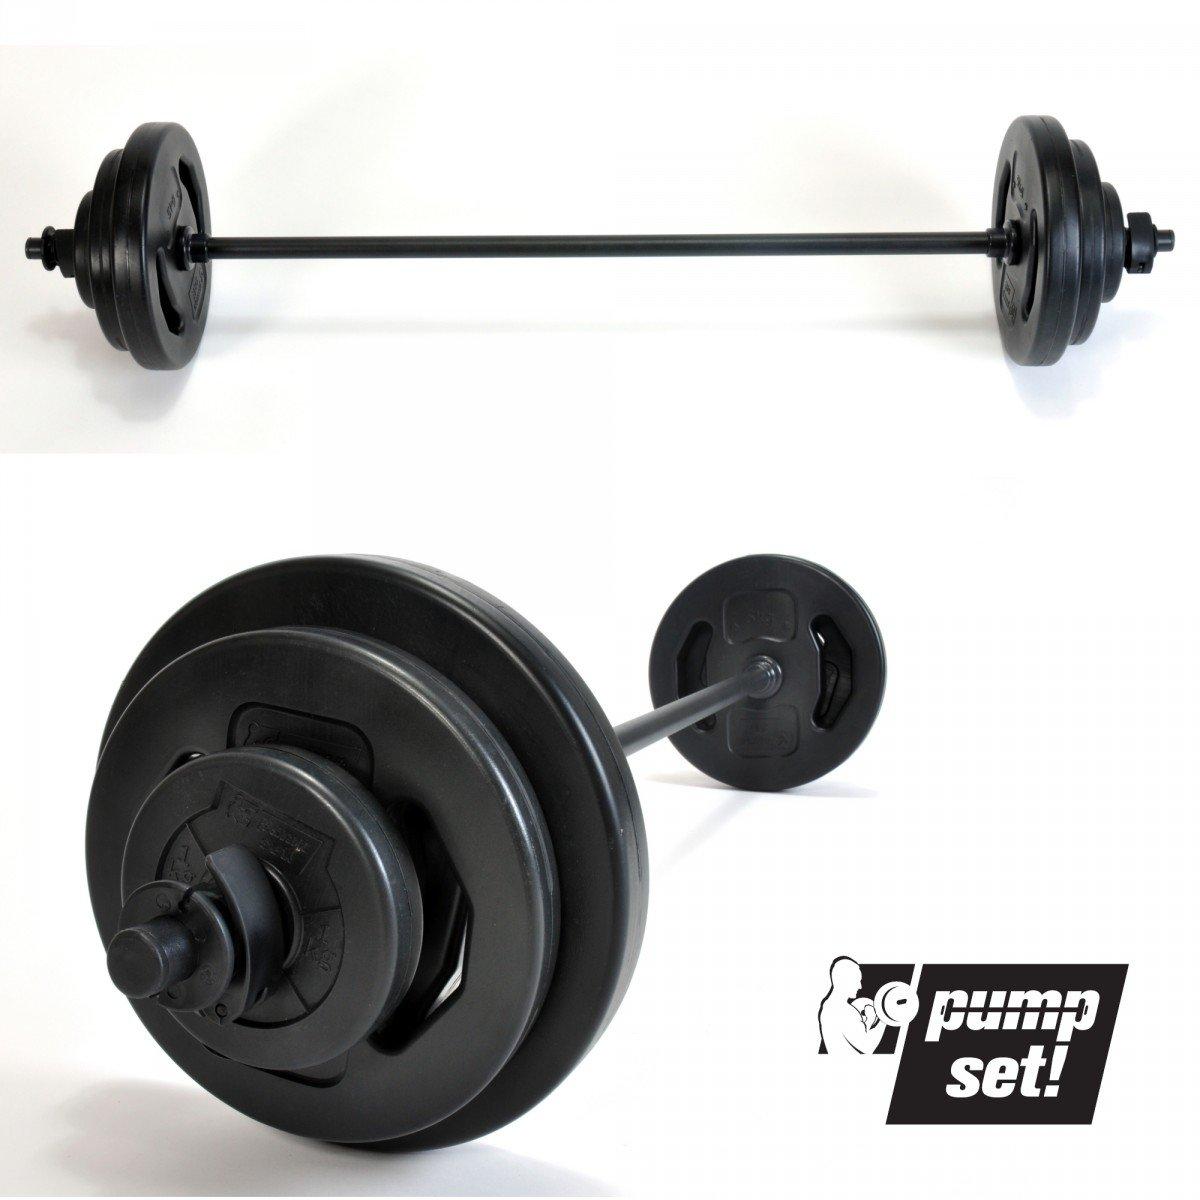 Original pumpset! 20kg - Juego de barra de pesas de 20 kg